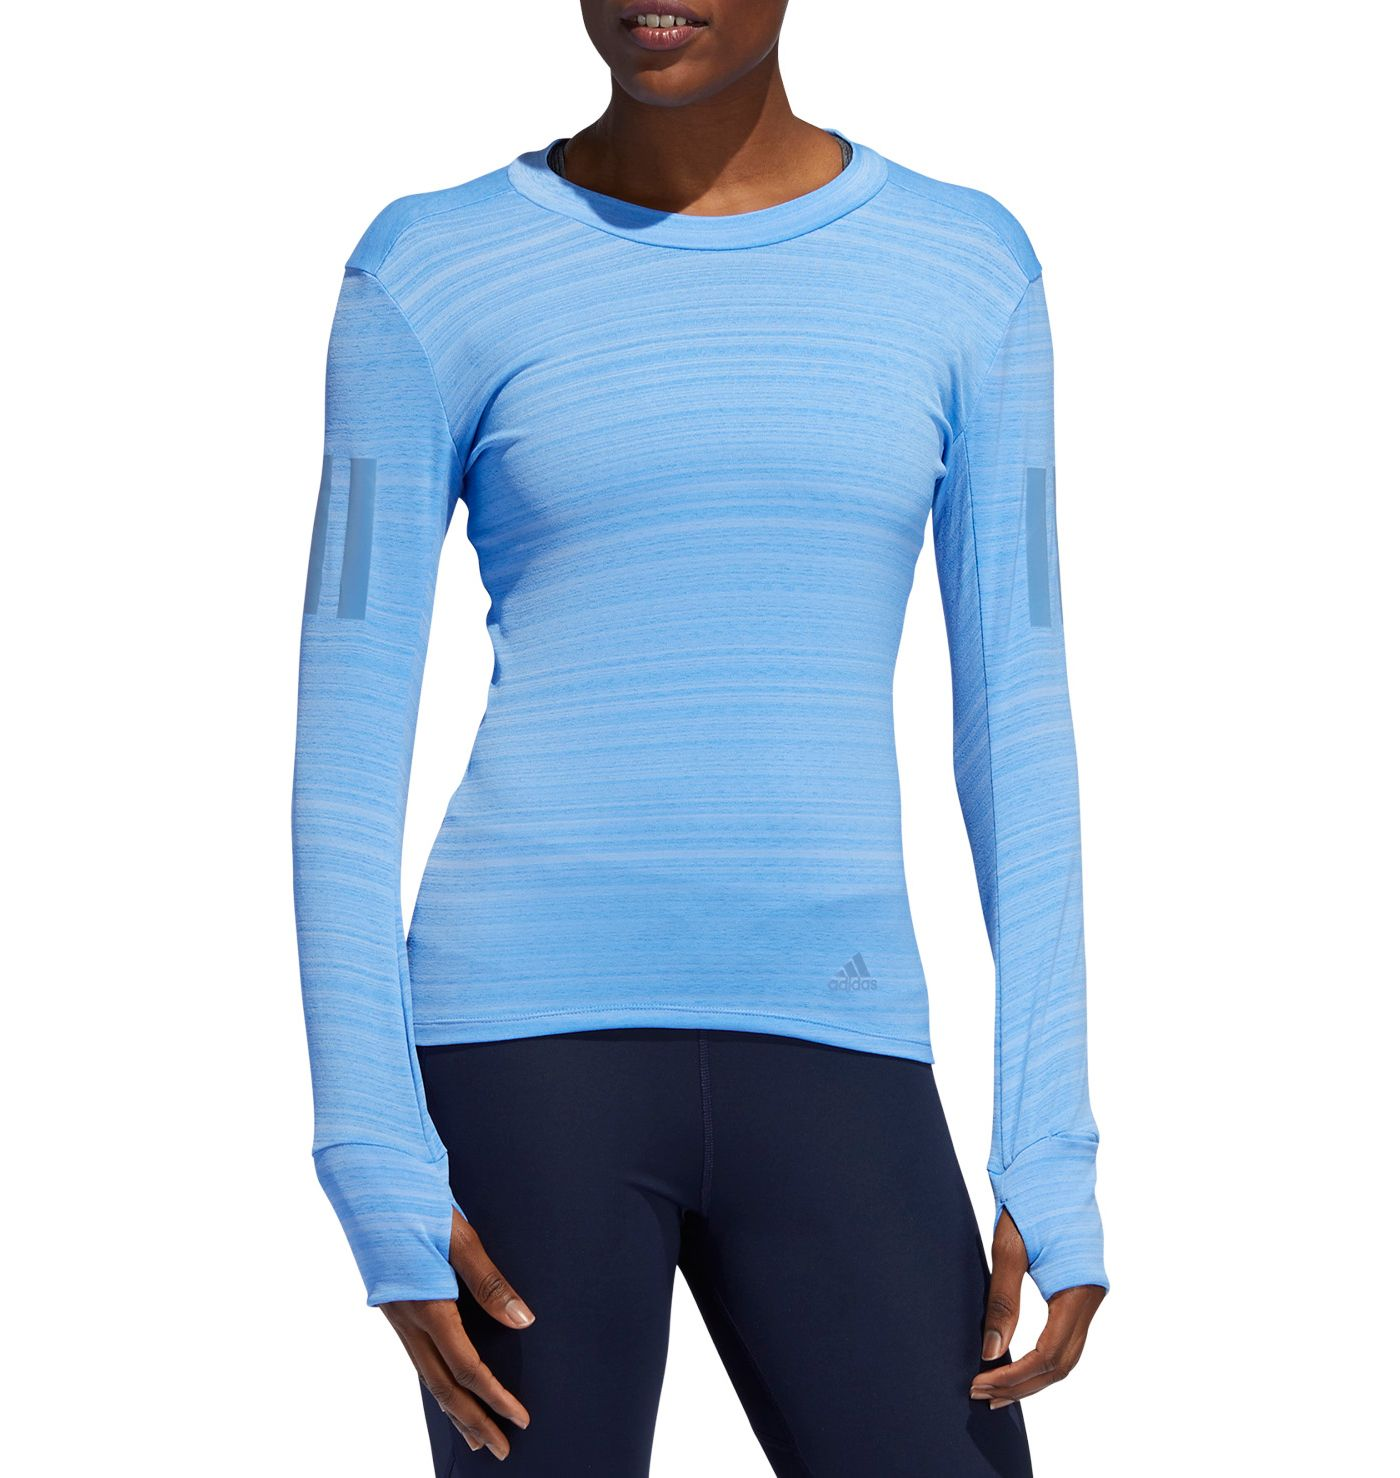 adidas Women's Supernova Long Sleeve T-Shirt